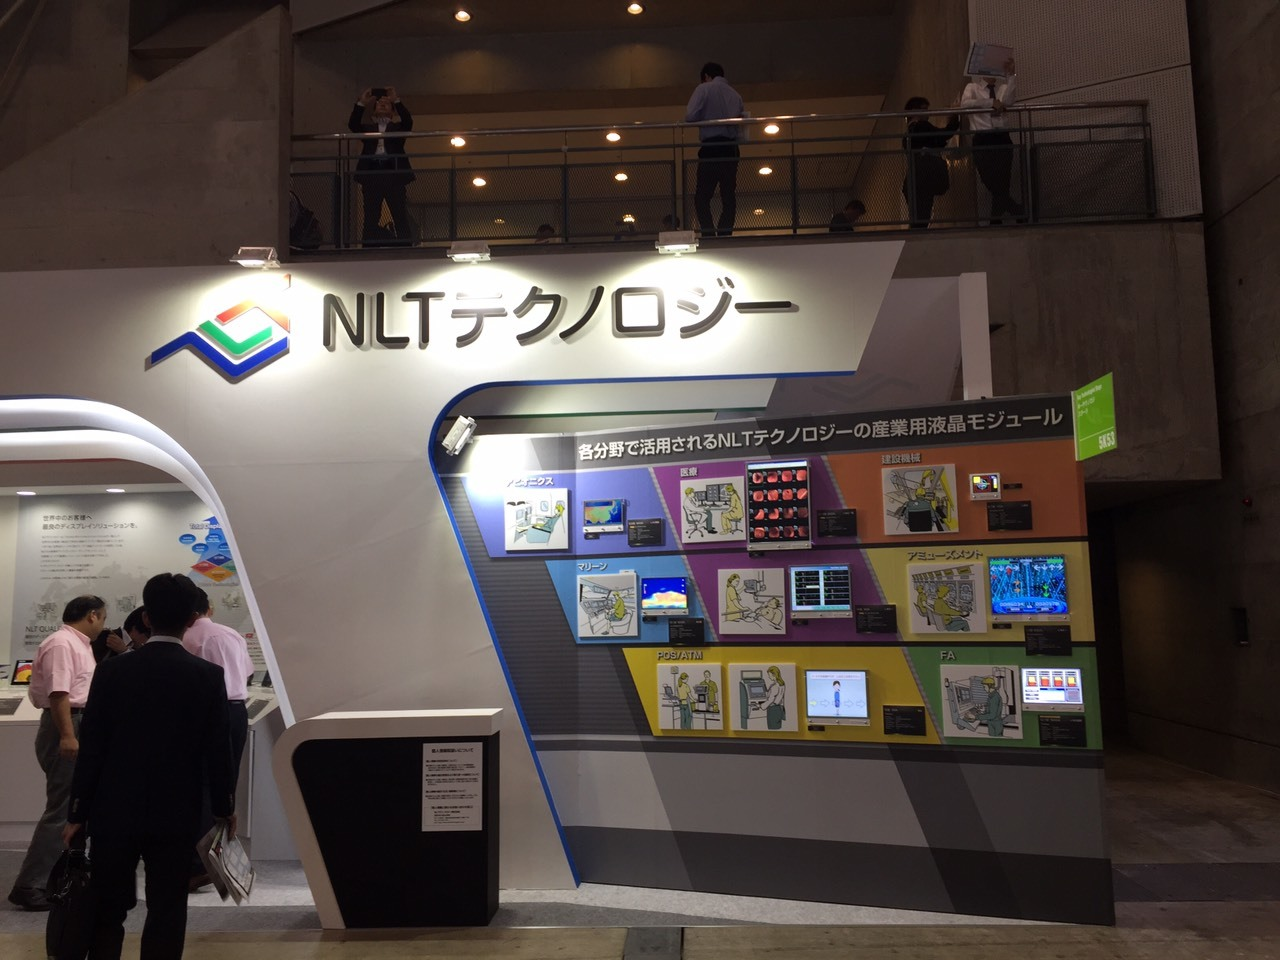 NLTテクノロジー_d0139566_15464120.jpg